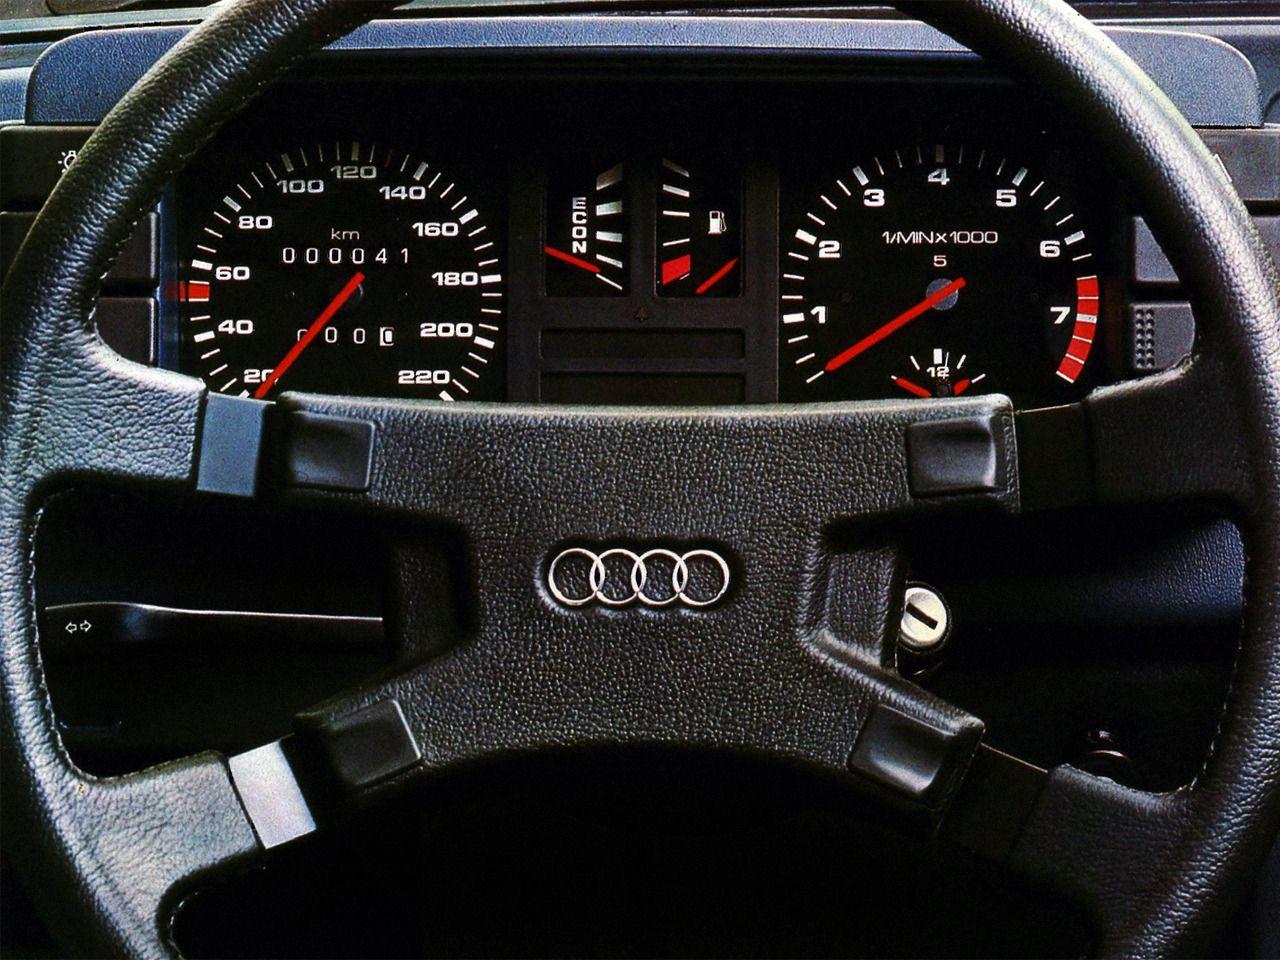 1981 Audi 80 Audi Car Interior Vehicle Gauge